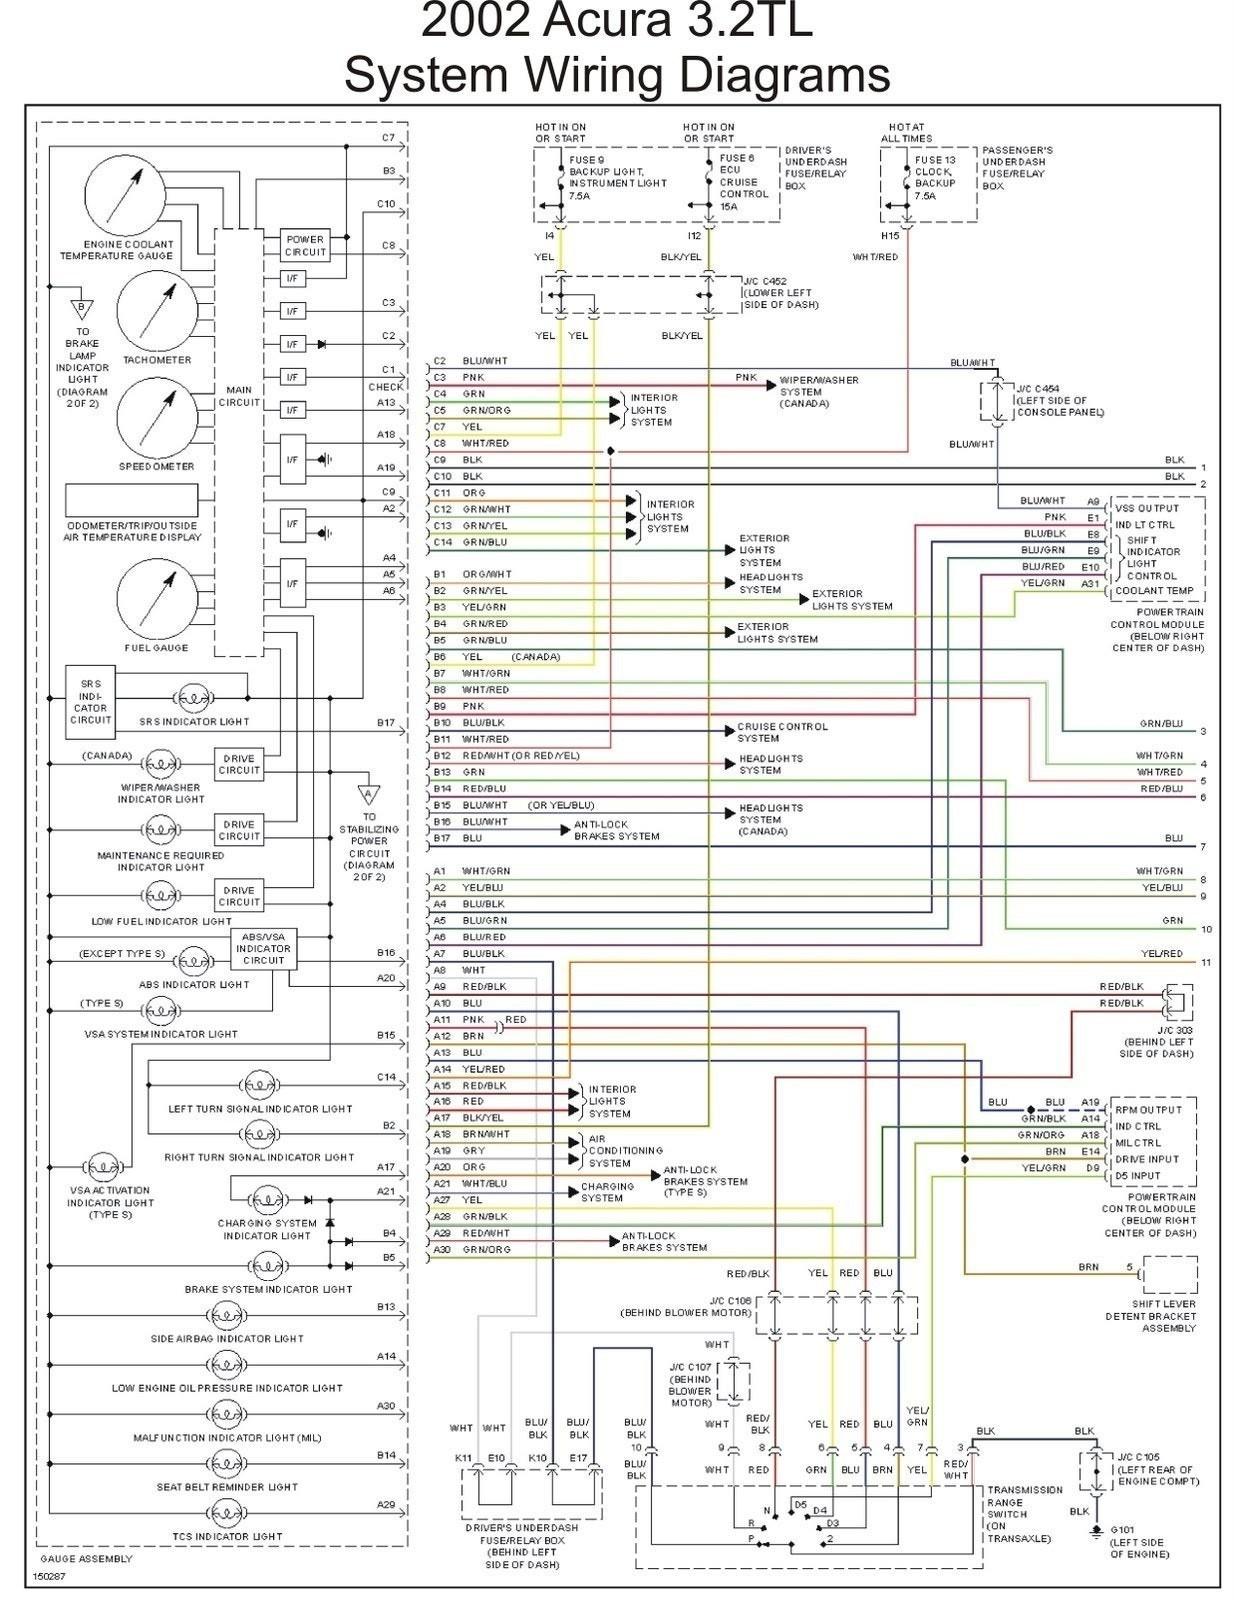 1986 Honda Accord Stereo Wiring | Wiring Diagram on honda civic electrical diagram, 94 honda civic parts, 94 accord wiring diagram, 98 civic wiring diagram, honda civic wiring harness diagram, 1990 crx light wiring diagram, 96 civic wiring diagram, 97 honda wiring diagram, 92 civic alternator wiring diagram, 4 wheeler wiring diagram, 94 acura integra wiring diagram, 95 civic wiring diagram, 1994 honda civic parts diagram, 94 honda civic fuel tank, 94 honda civic water pump, integra brake light wiring diagram, 88 honda civic chassis wiring diagram, 94 jeep grand cherokee radio wiring diagram, honda civic ex door wiring diagram, 97 civic wiring diagram,